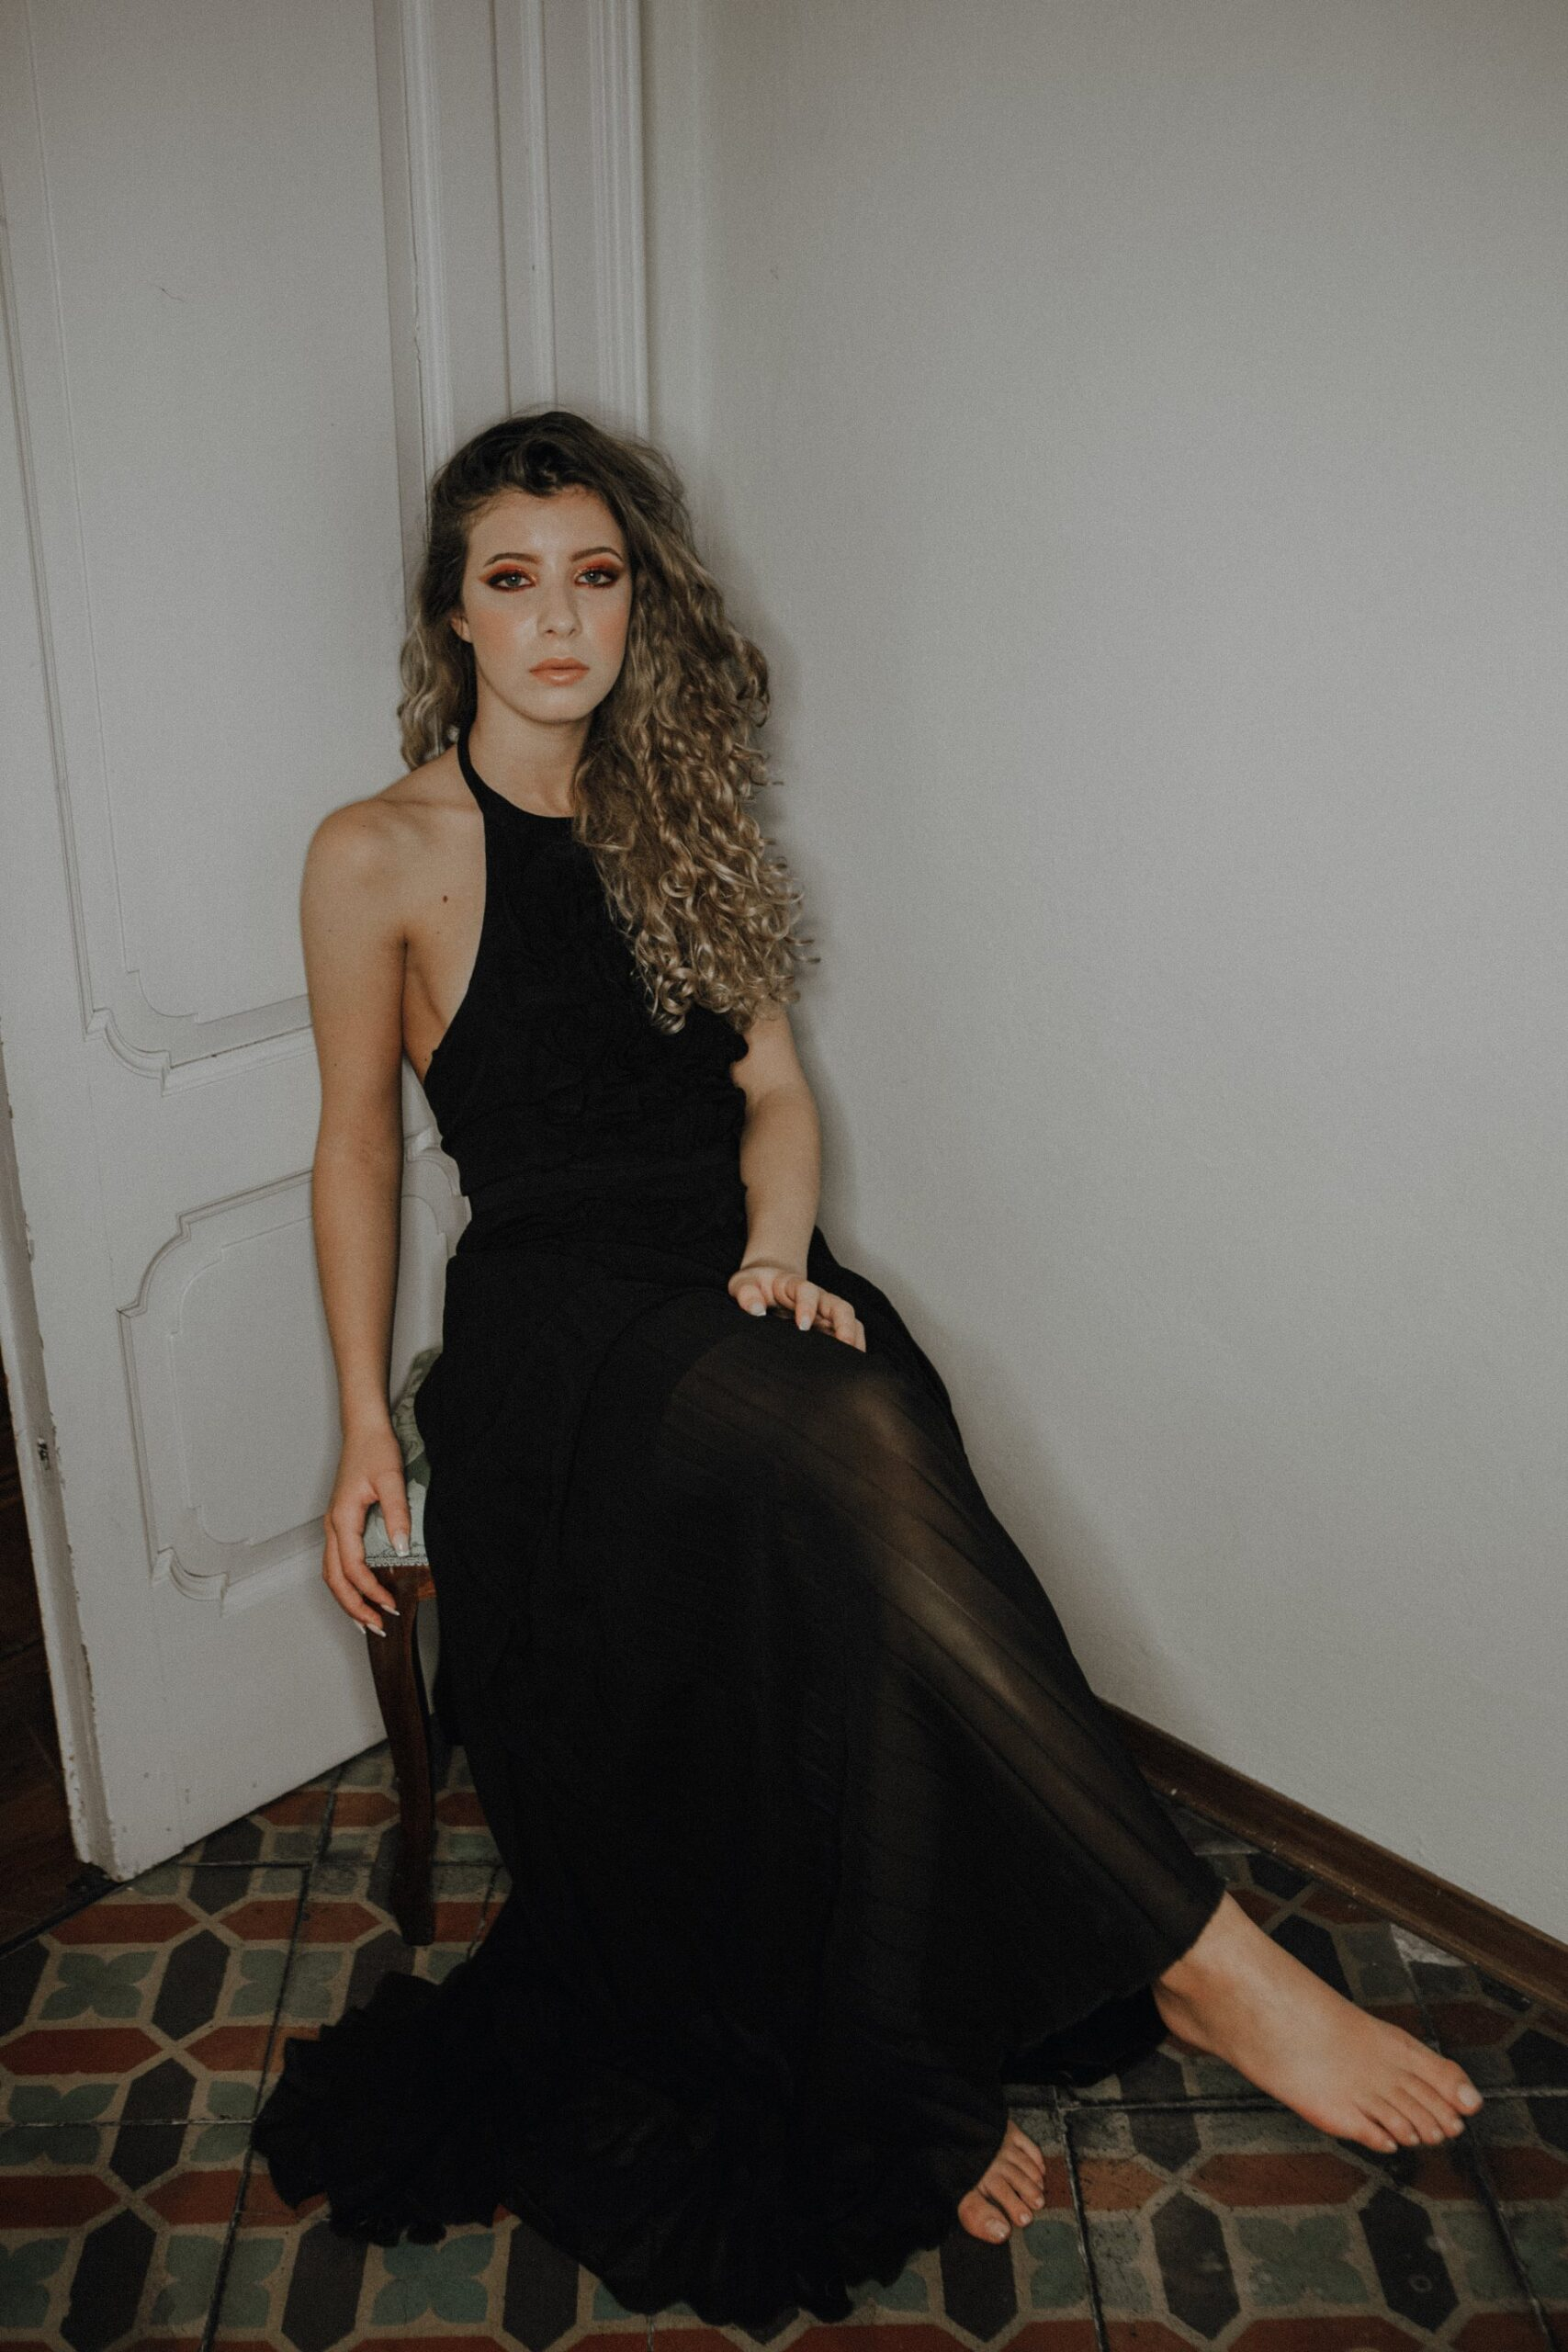 editoriale | moda | fotografa | brescia | mantova | rhamely